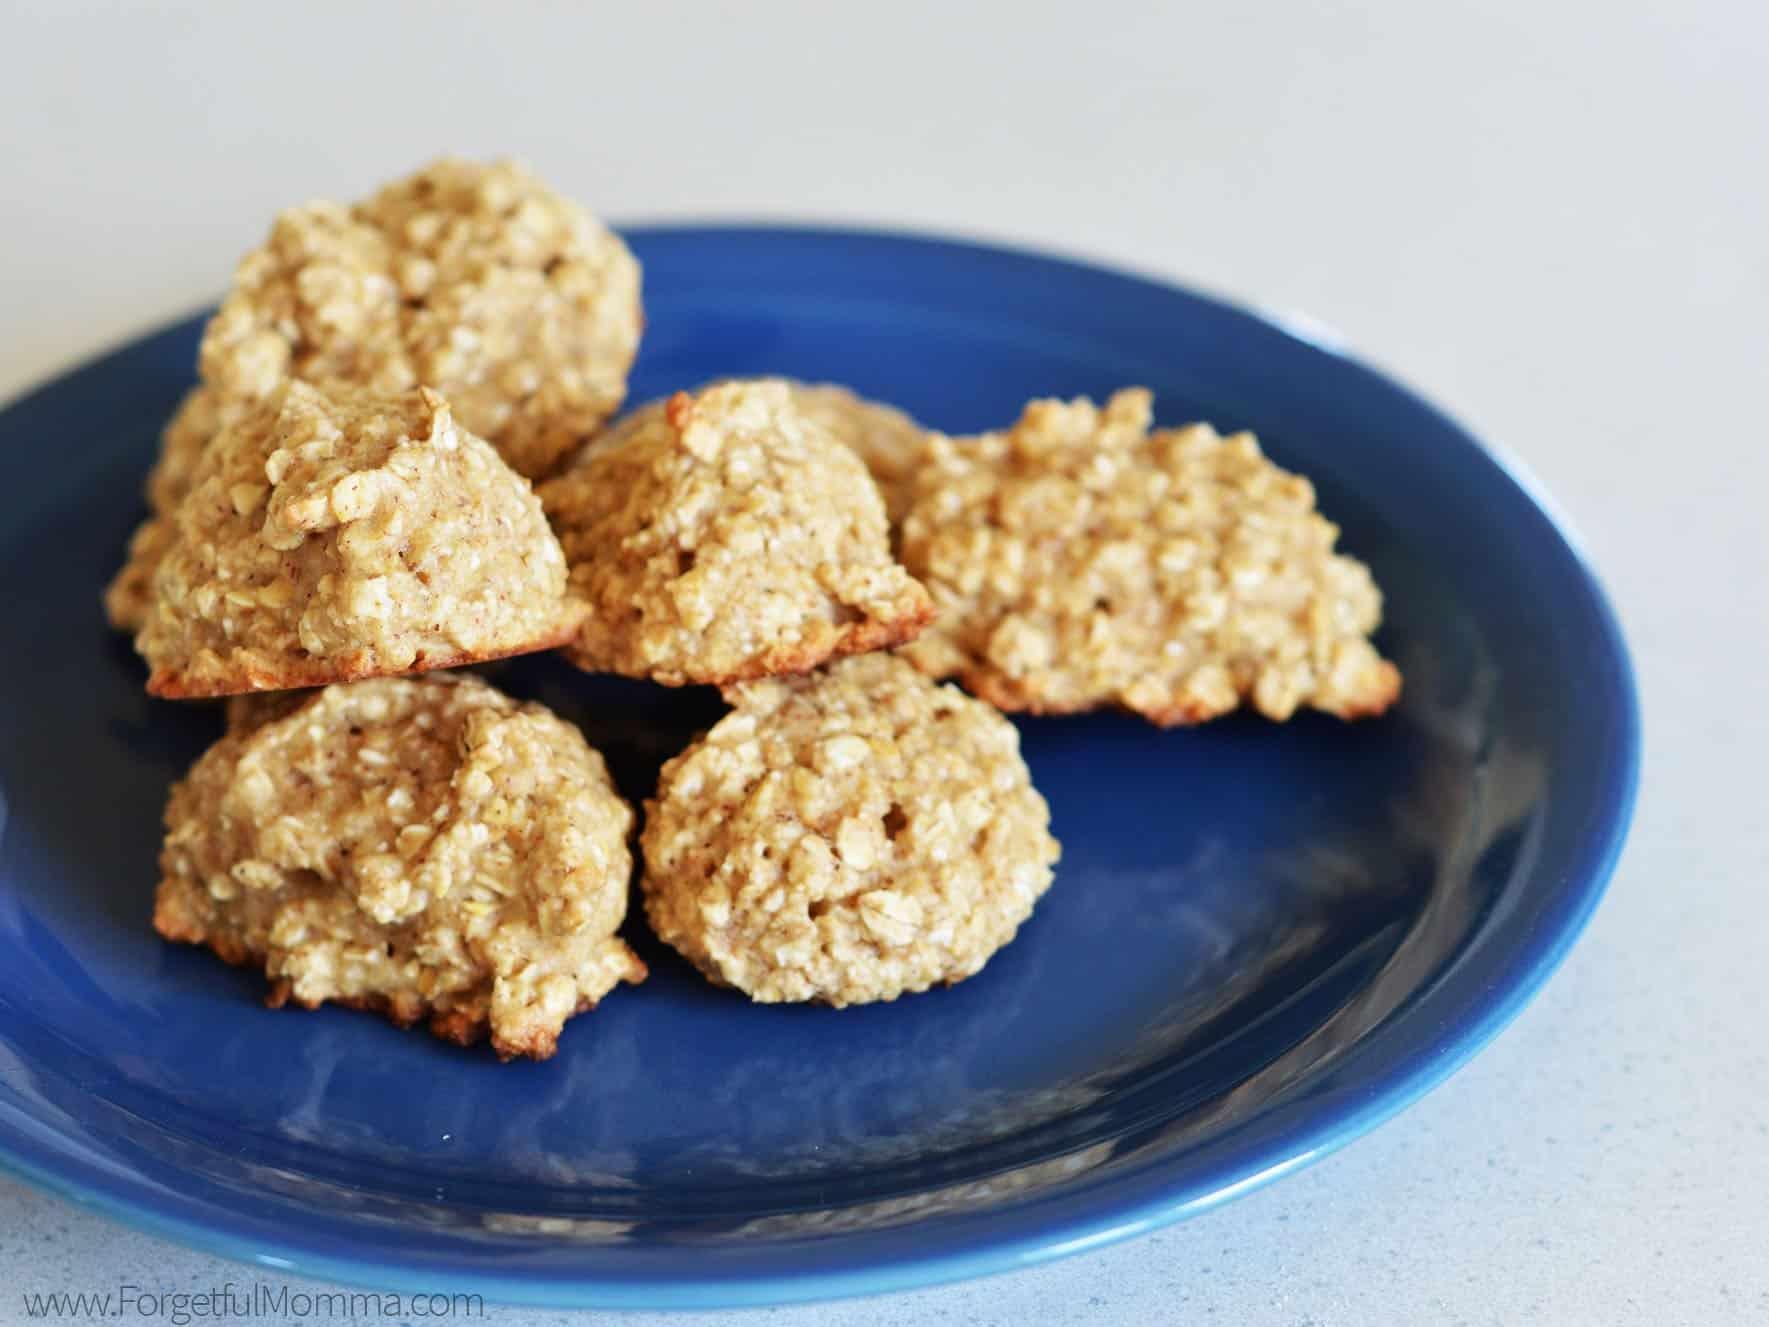 Egg Free Dairy Free Oatmeal Cookies